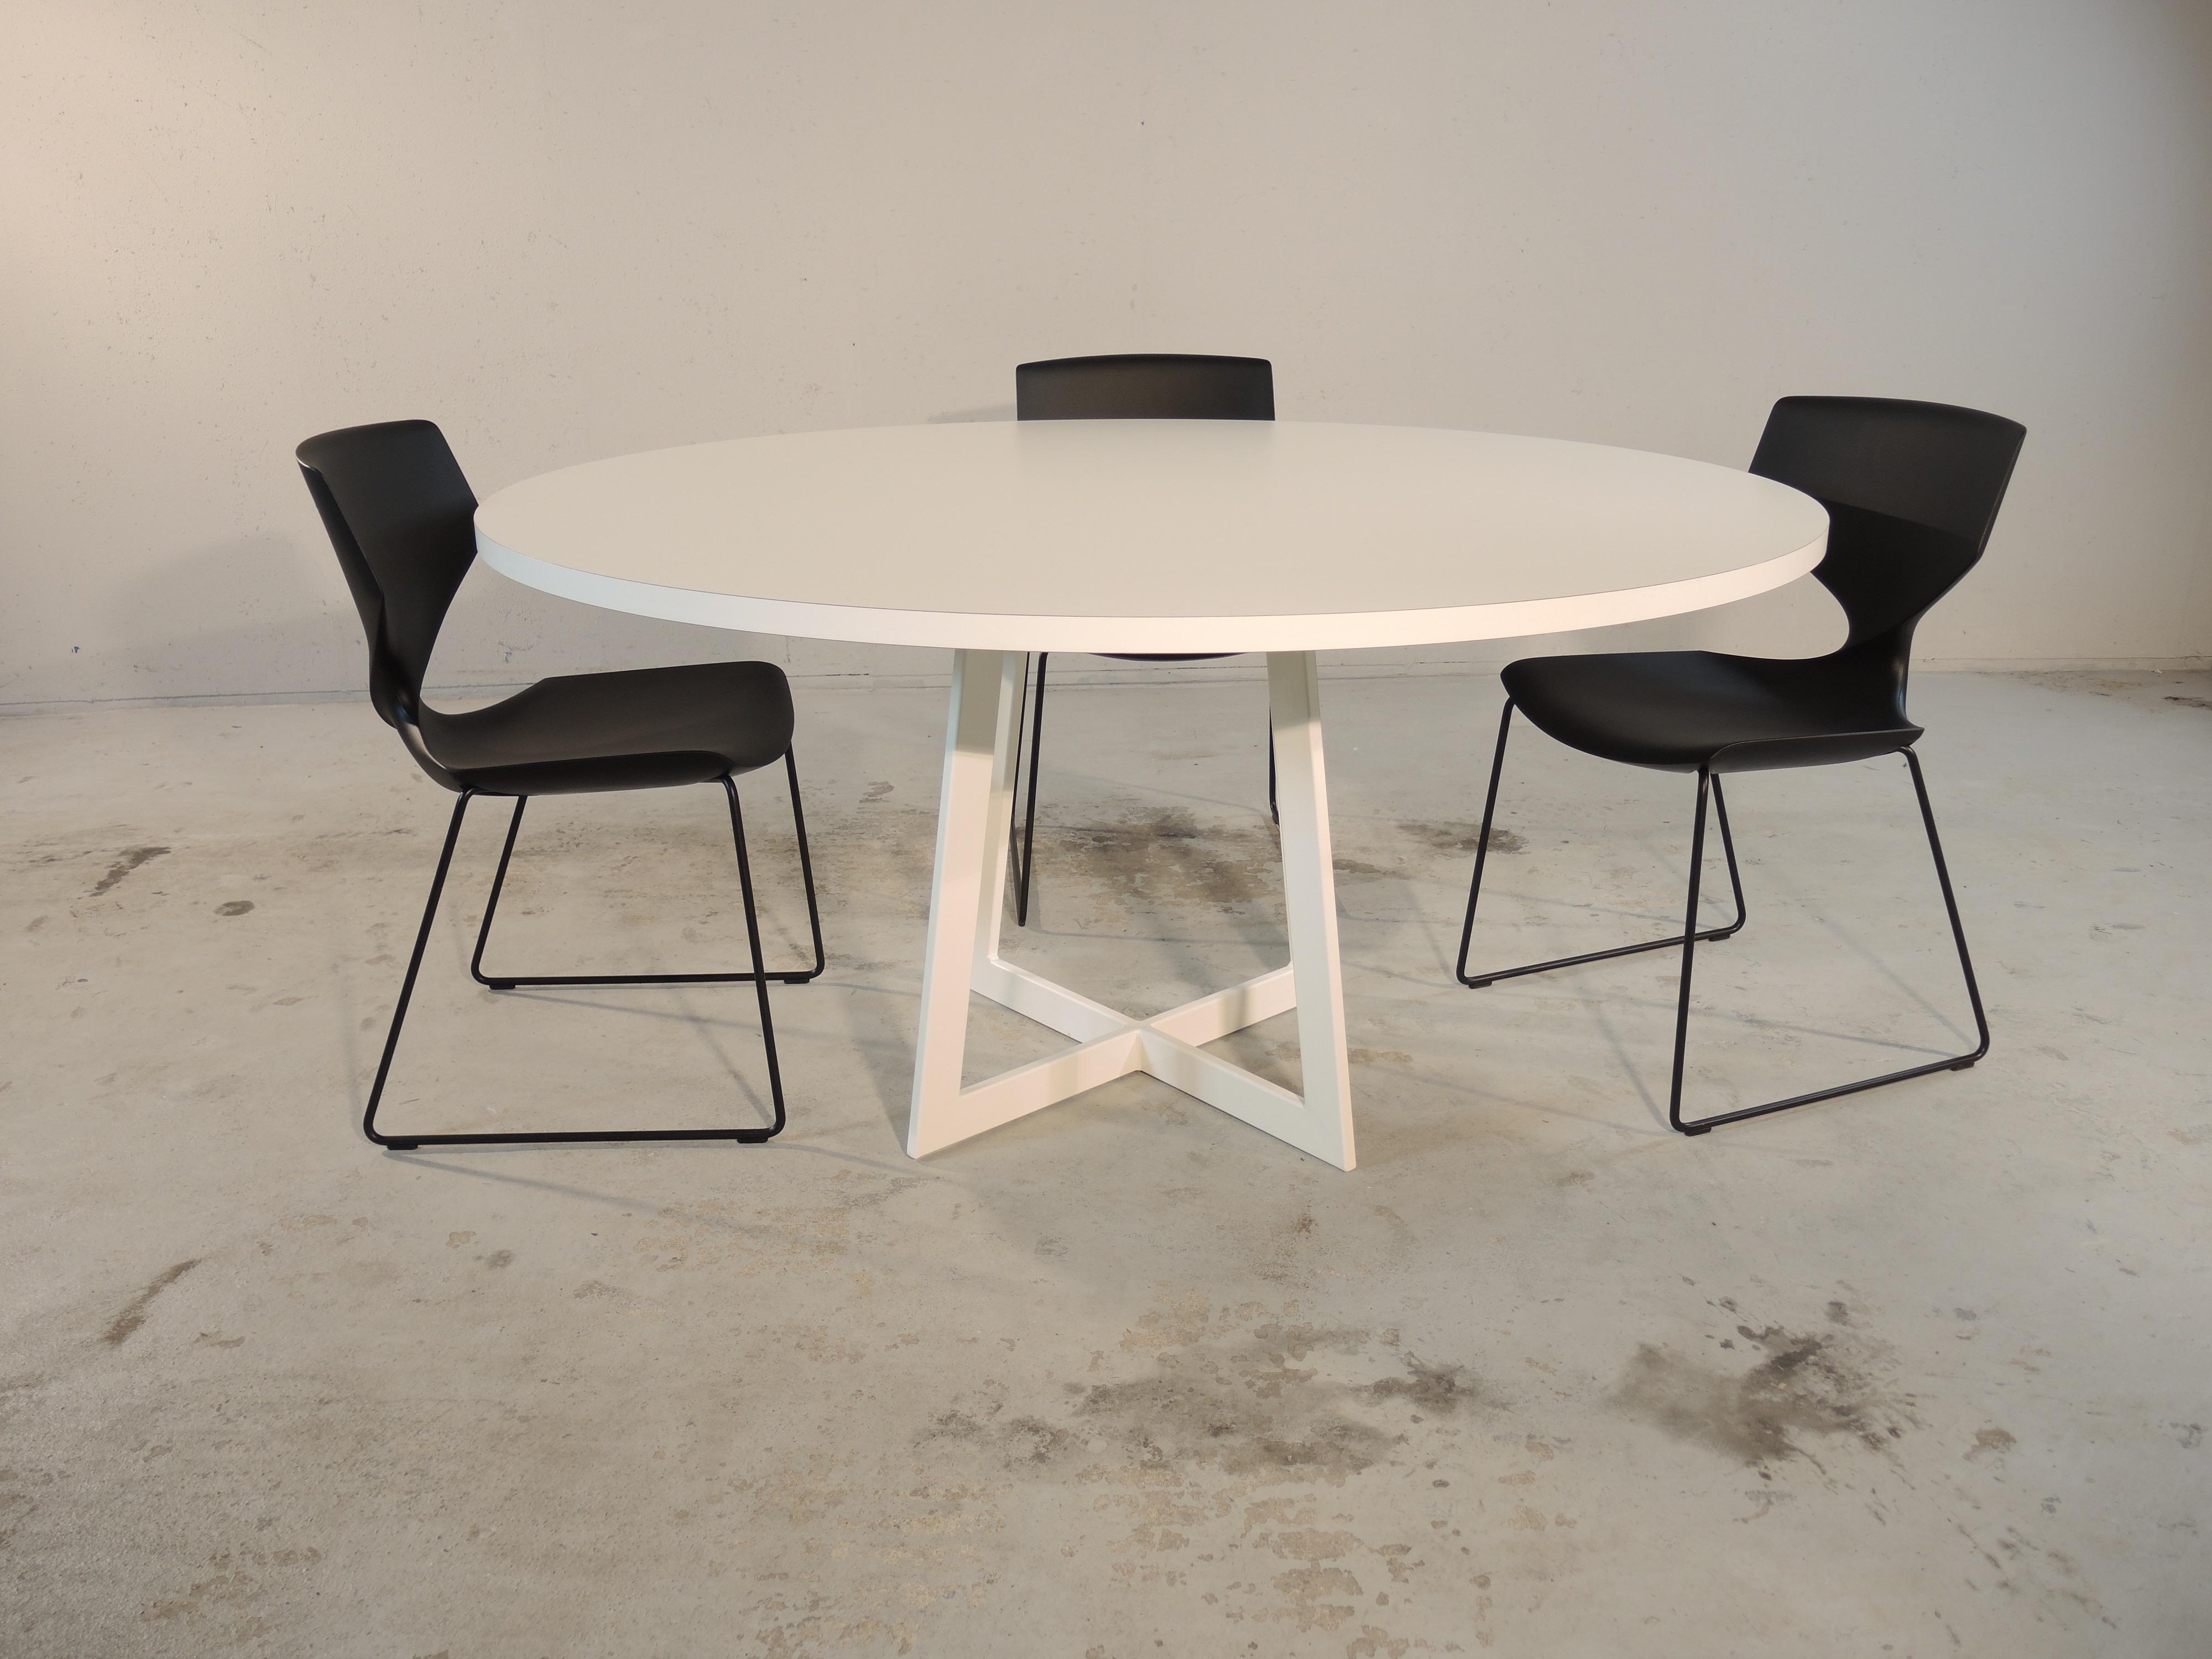 Ronde Witte Eettafel Design.Carzello Moderne Ronde Tafel